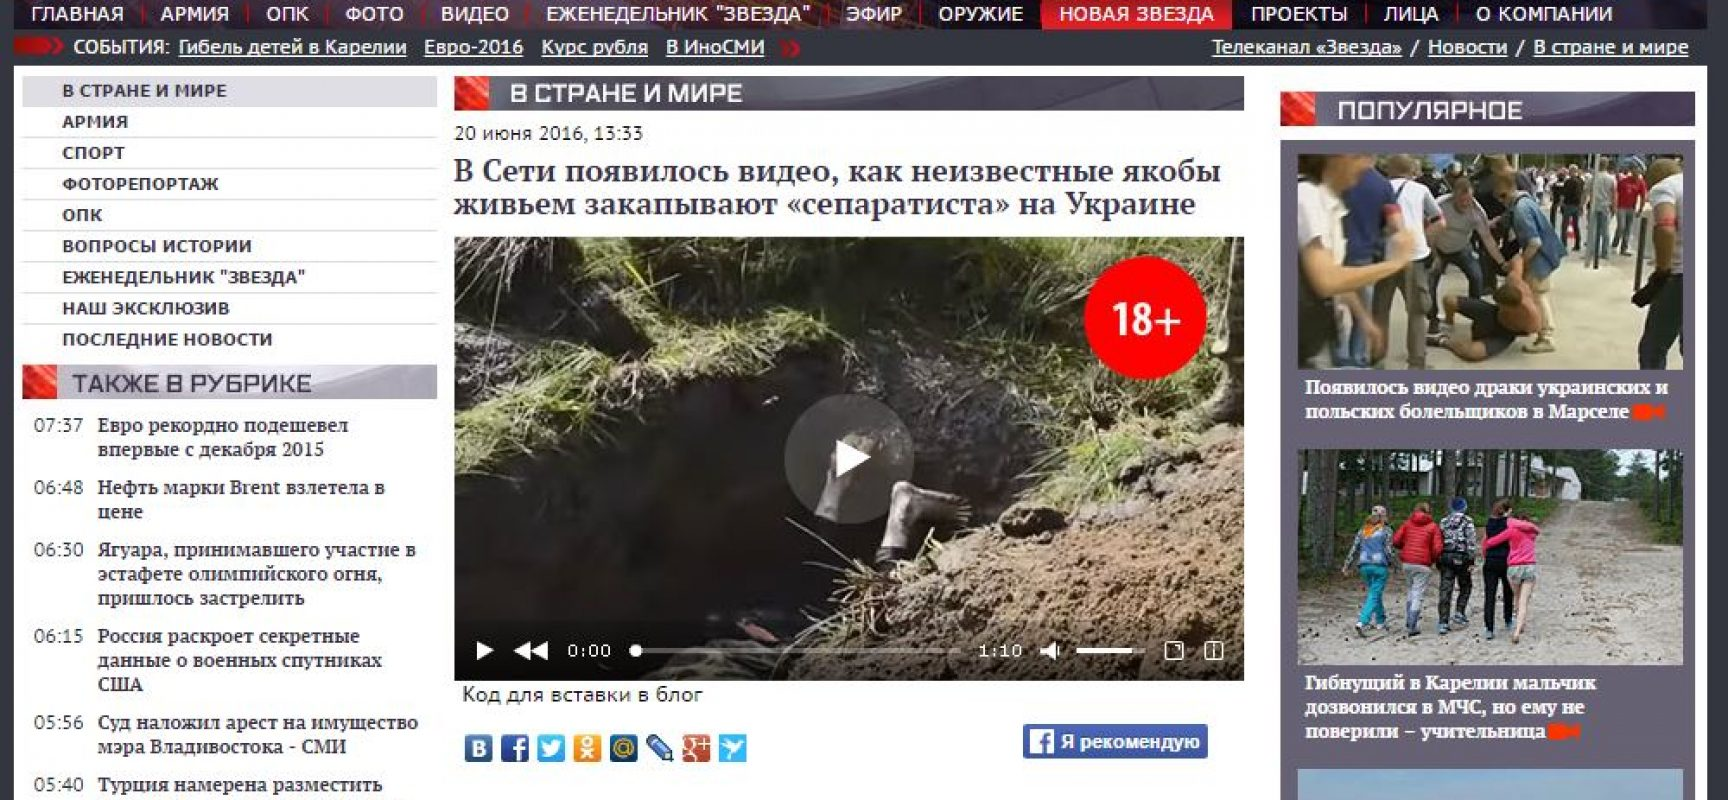 Fake: I militari ucraini seppelliscono vivo un miliziano